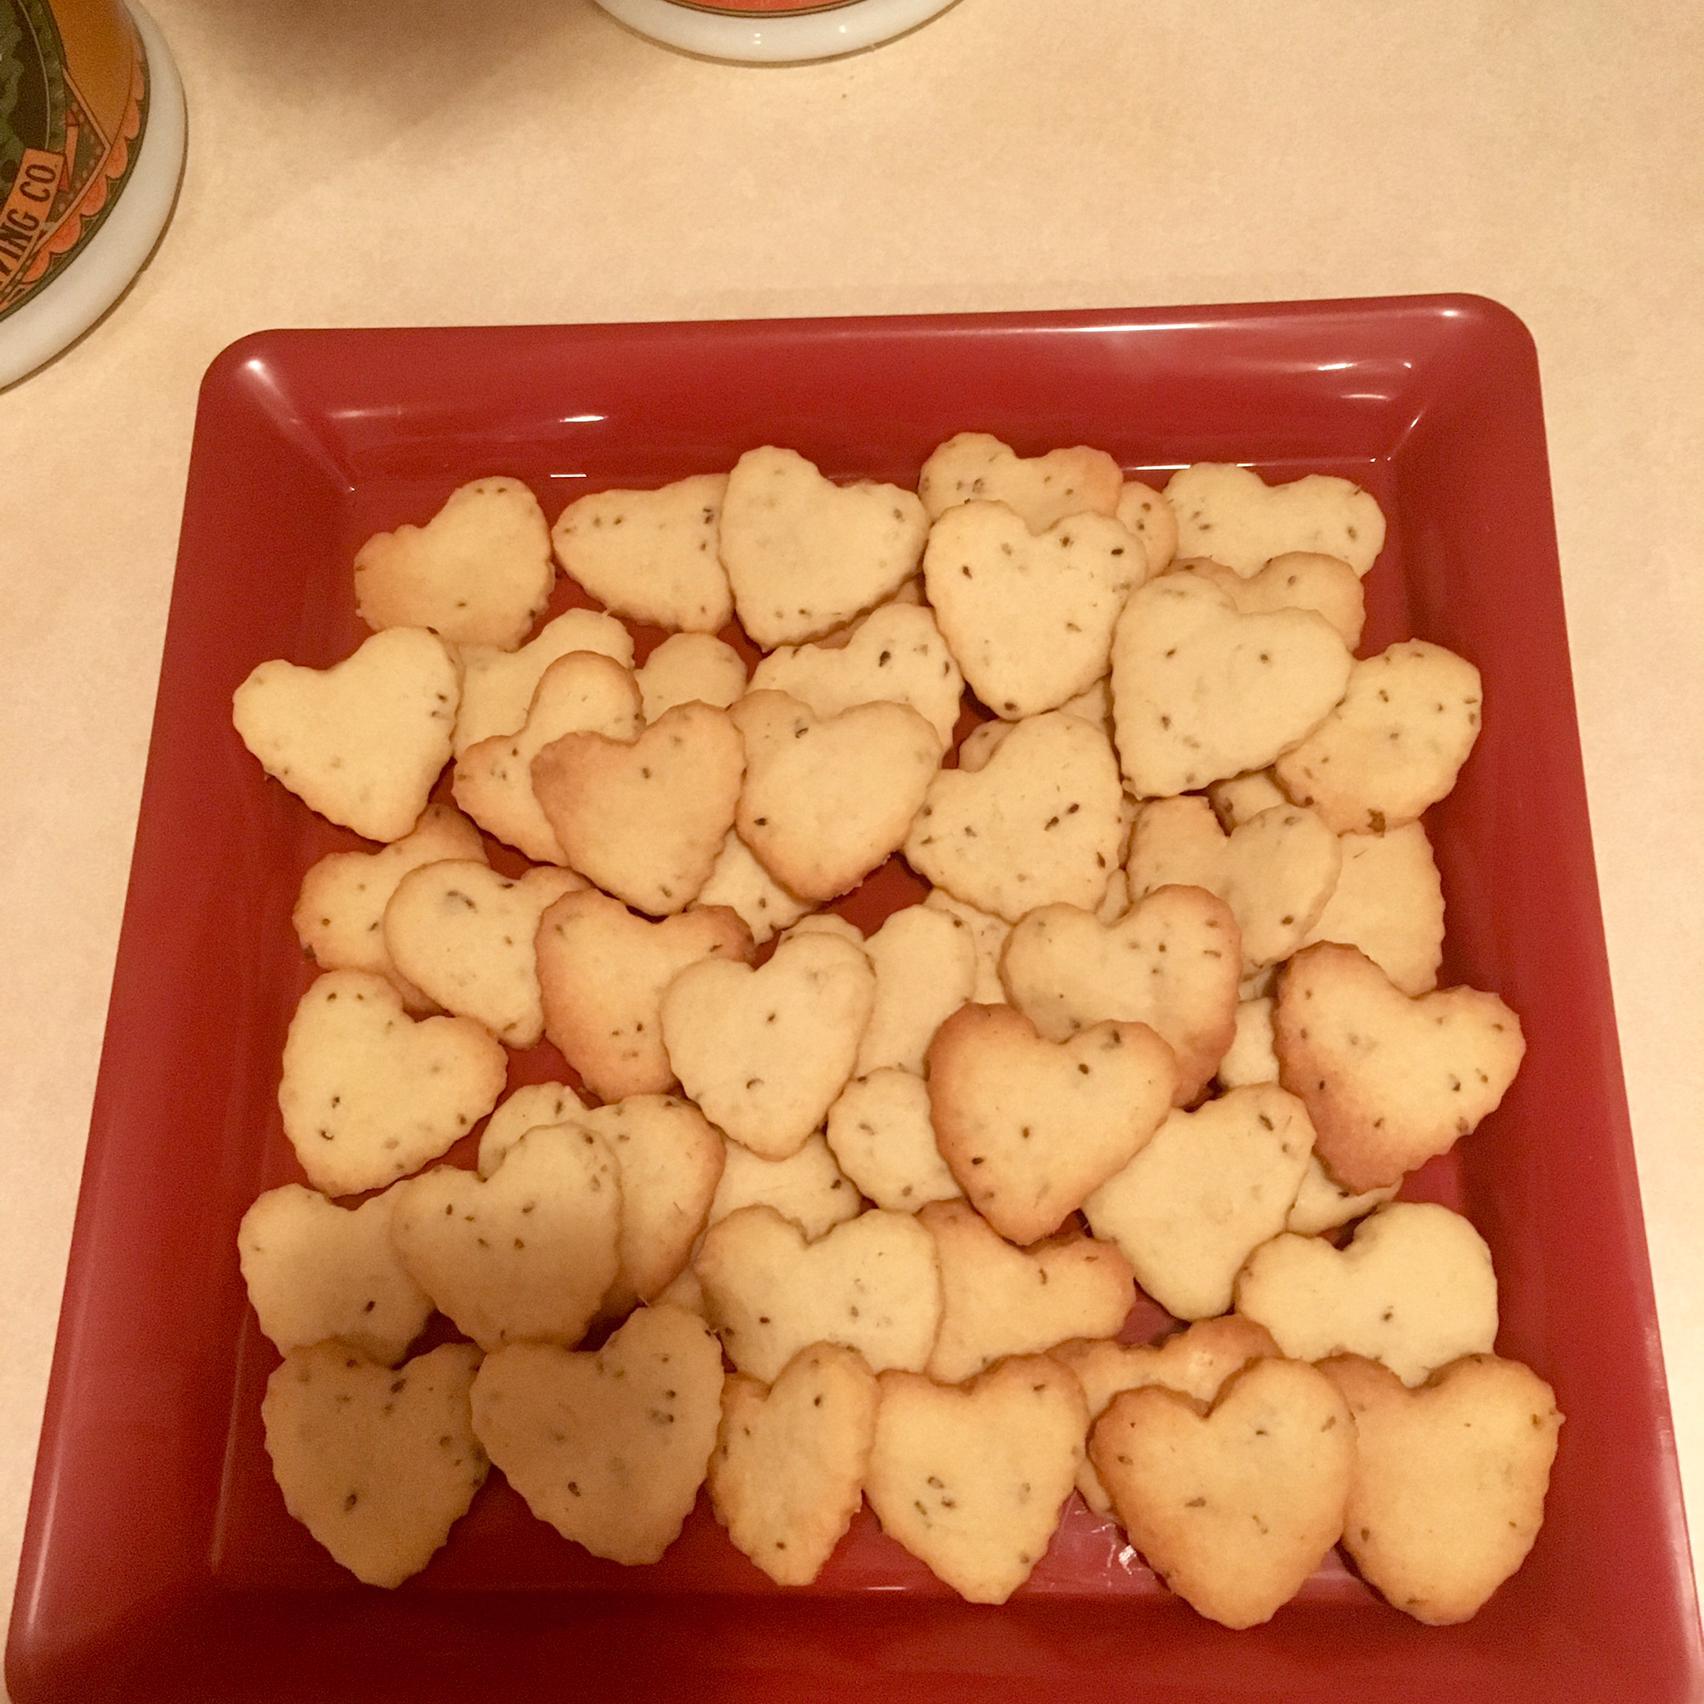 Anise Seed Borrachio Cookies Rosa